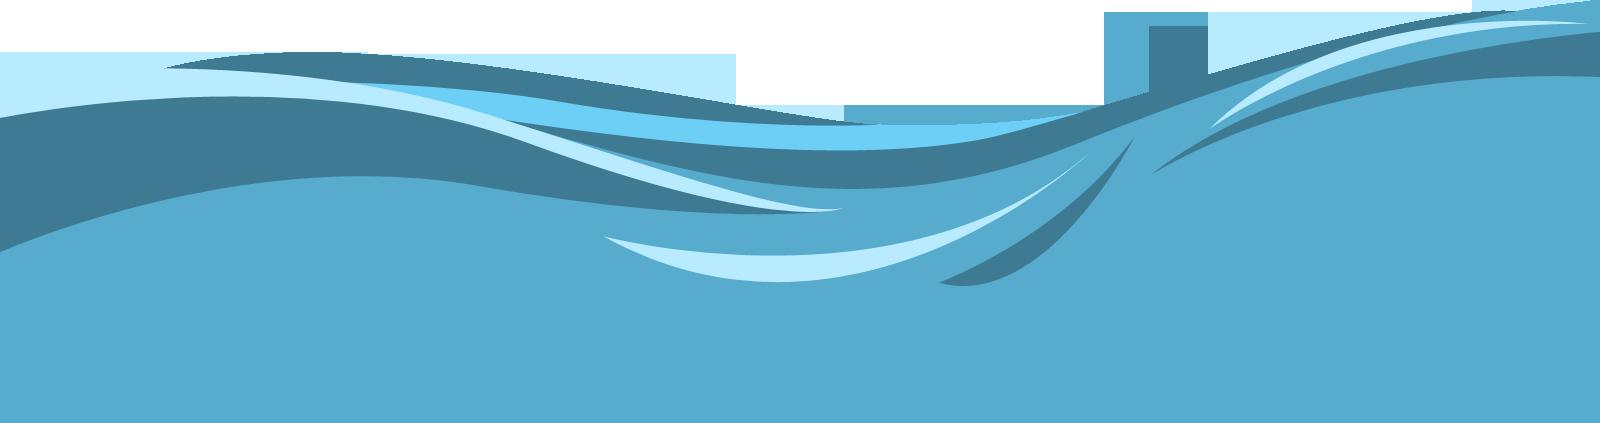 water-top